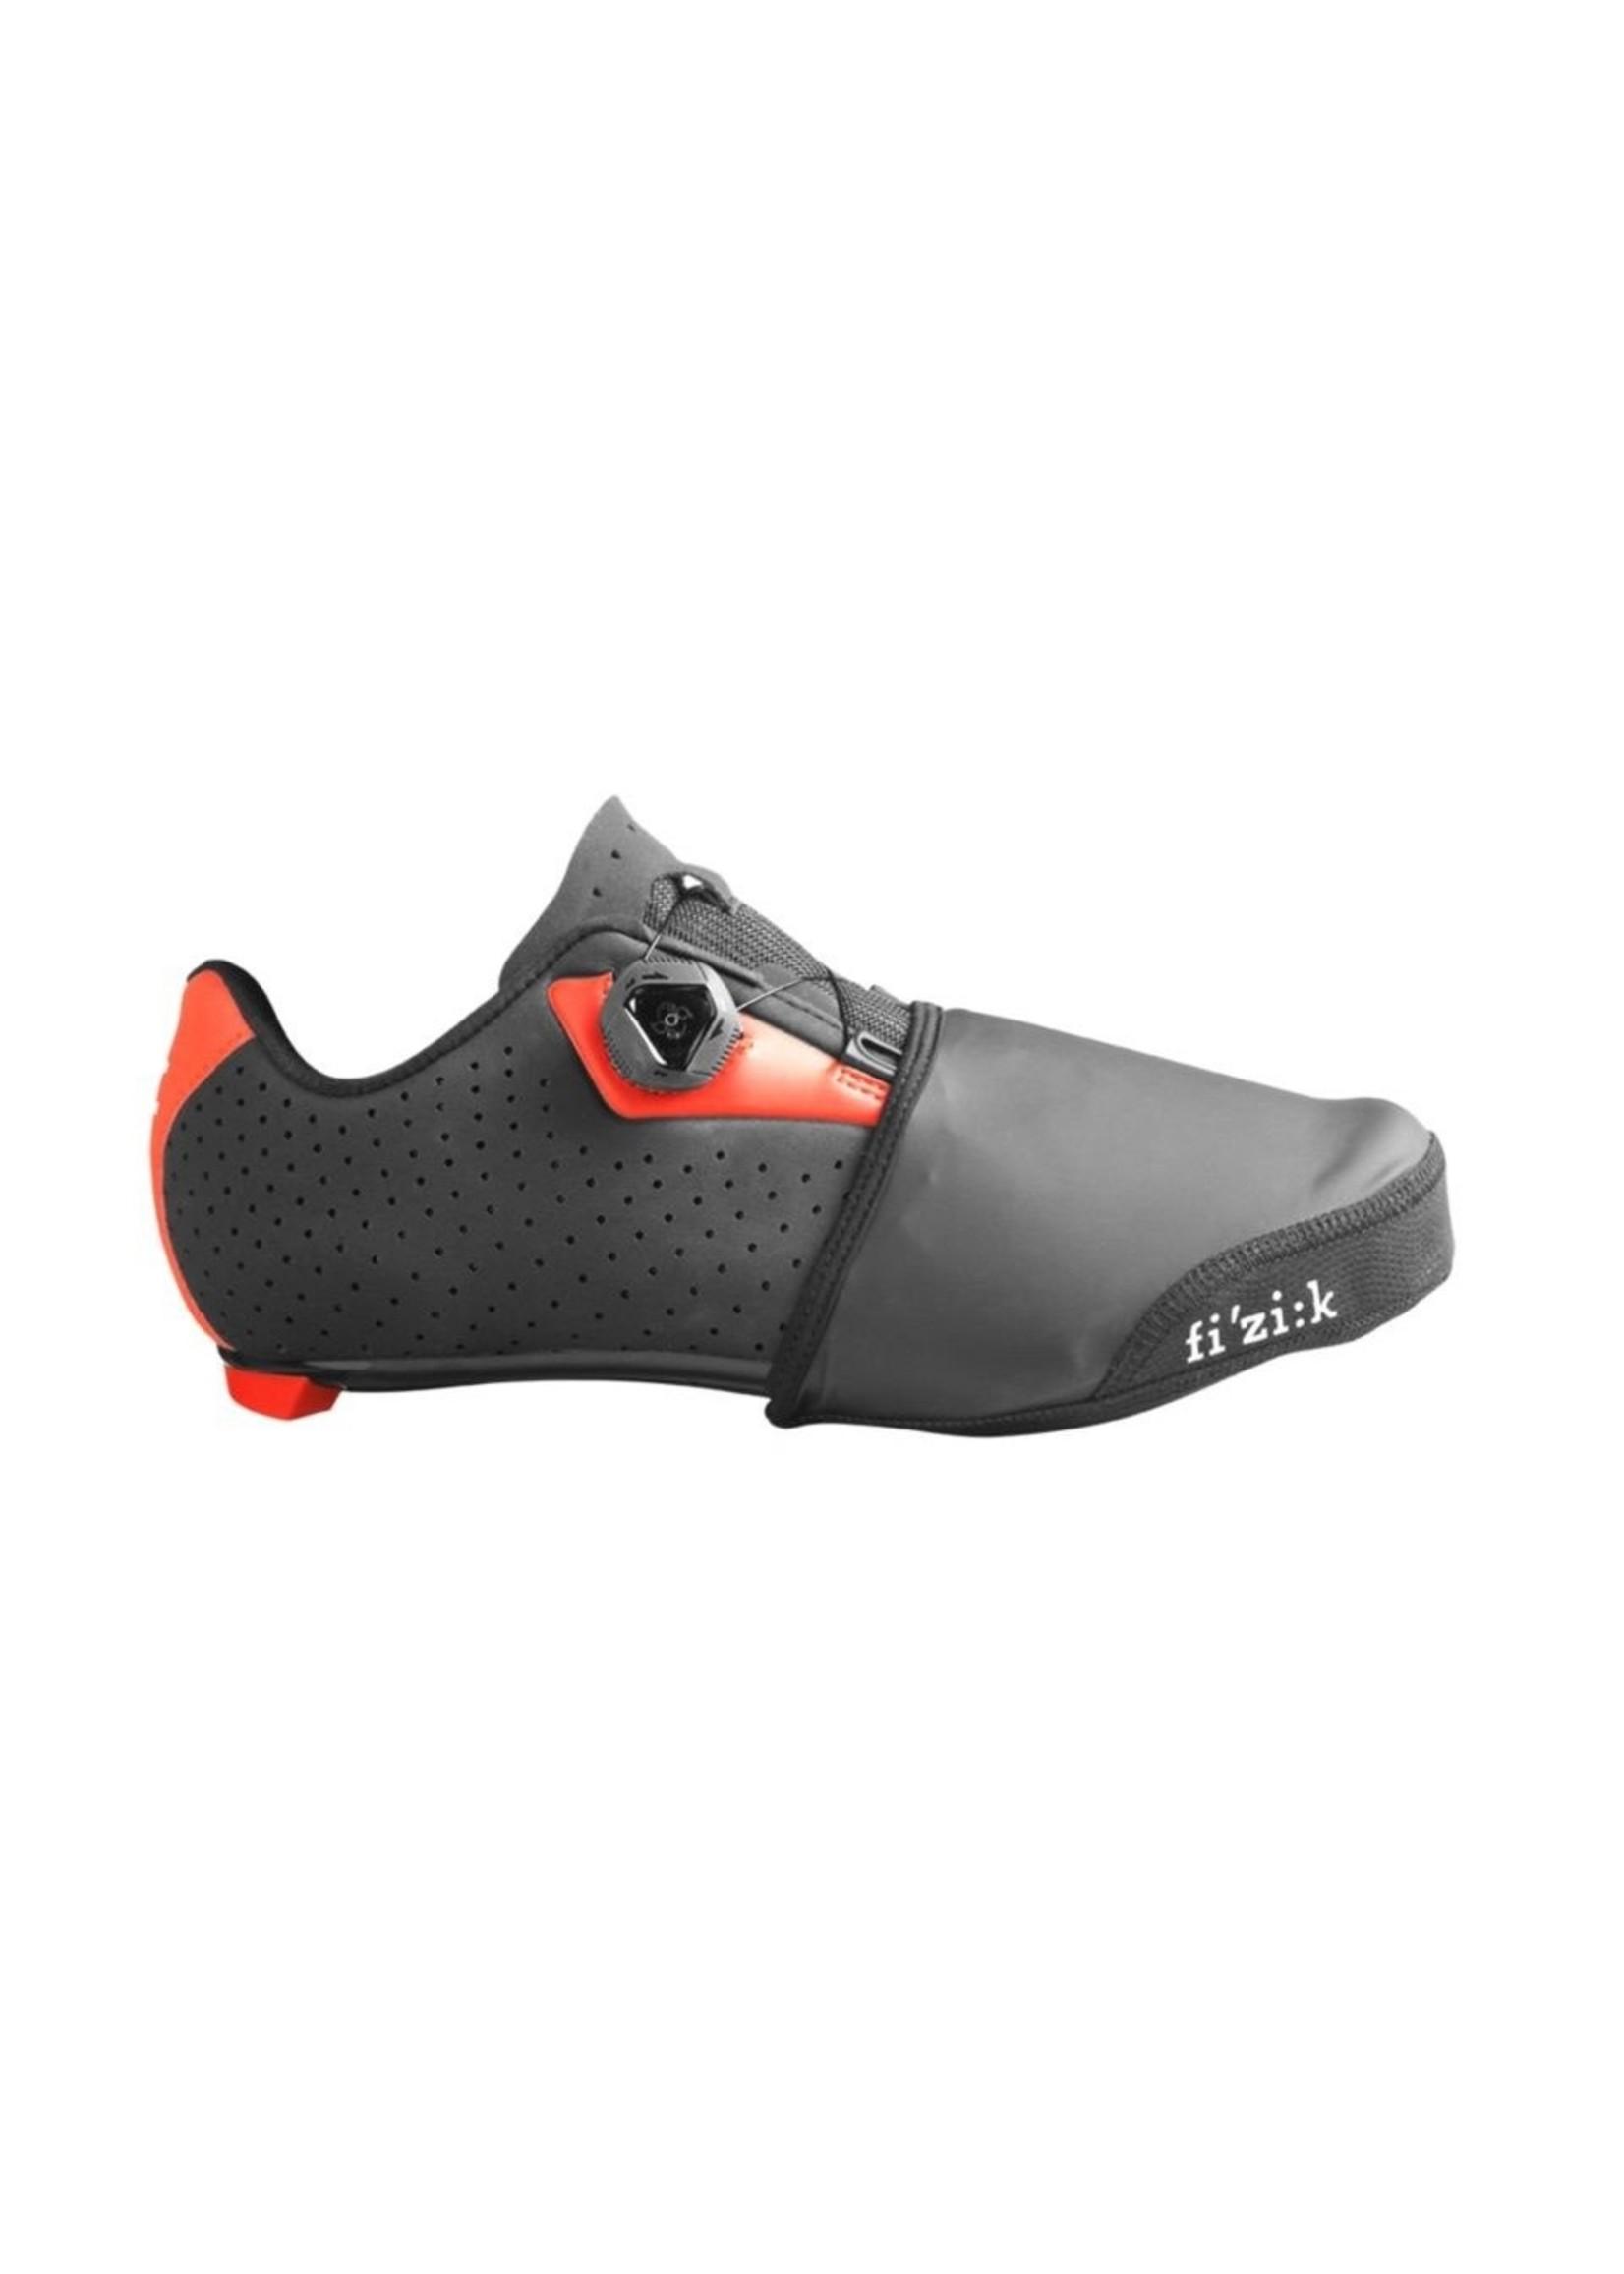 Fizik Footwear Accessories - Windproof Toe Cover - Black - Extra Small/Small